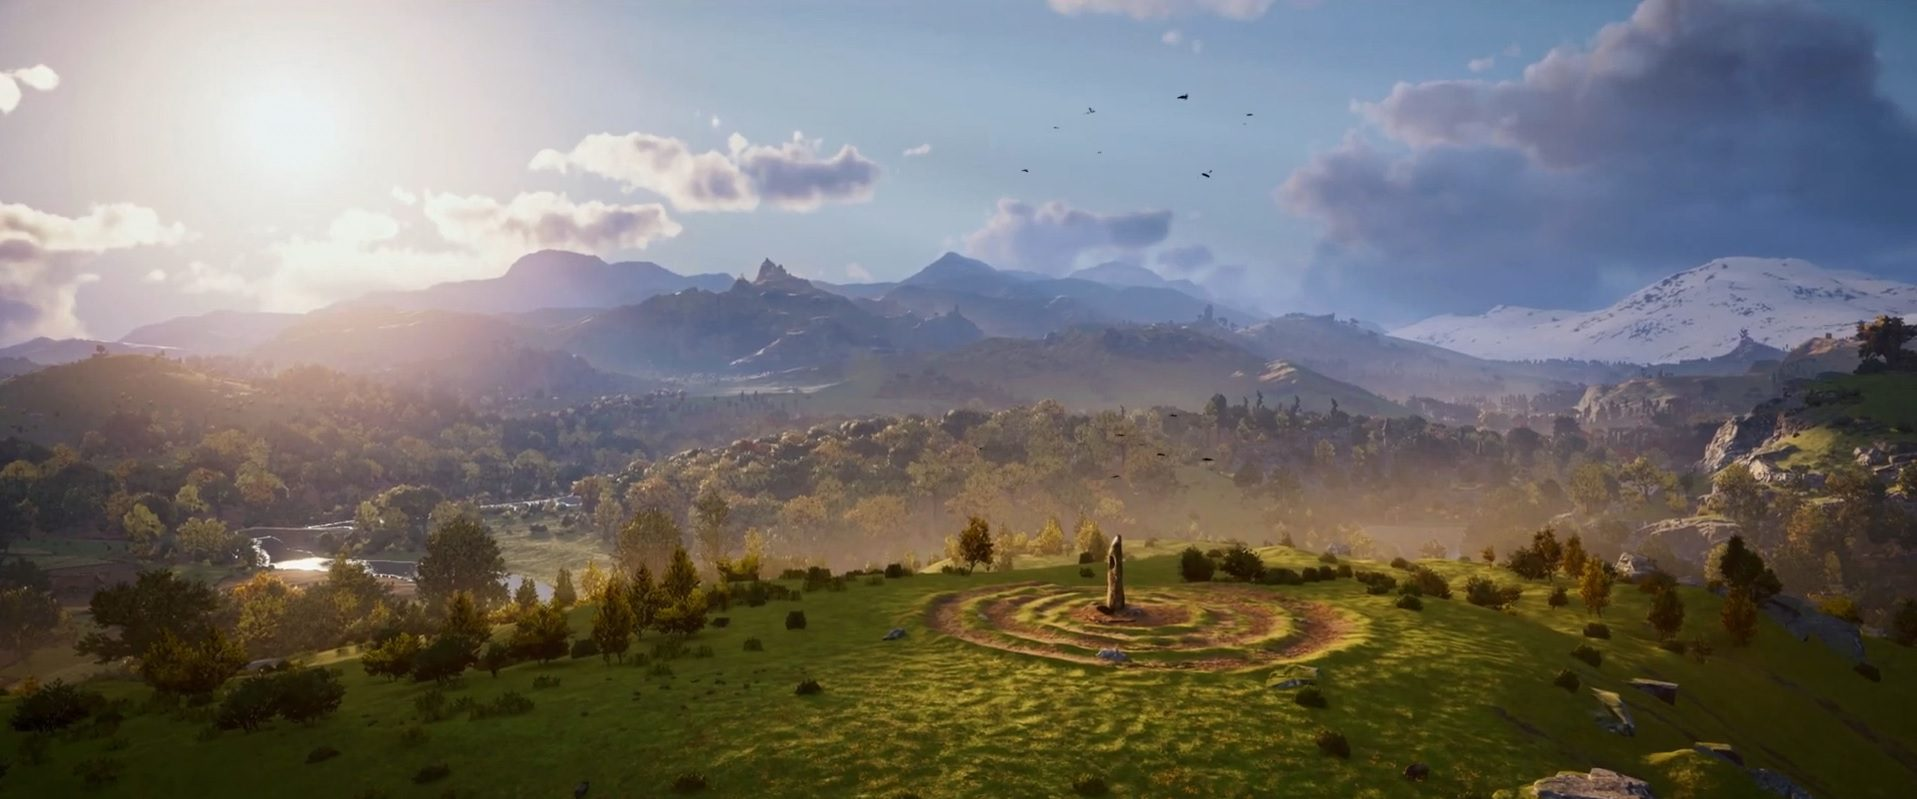 Assassin's Creed Valhalla Ireland